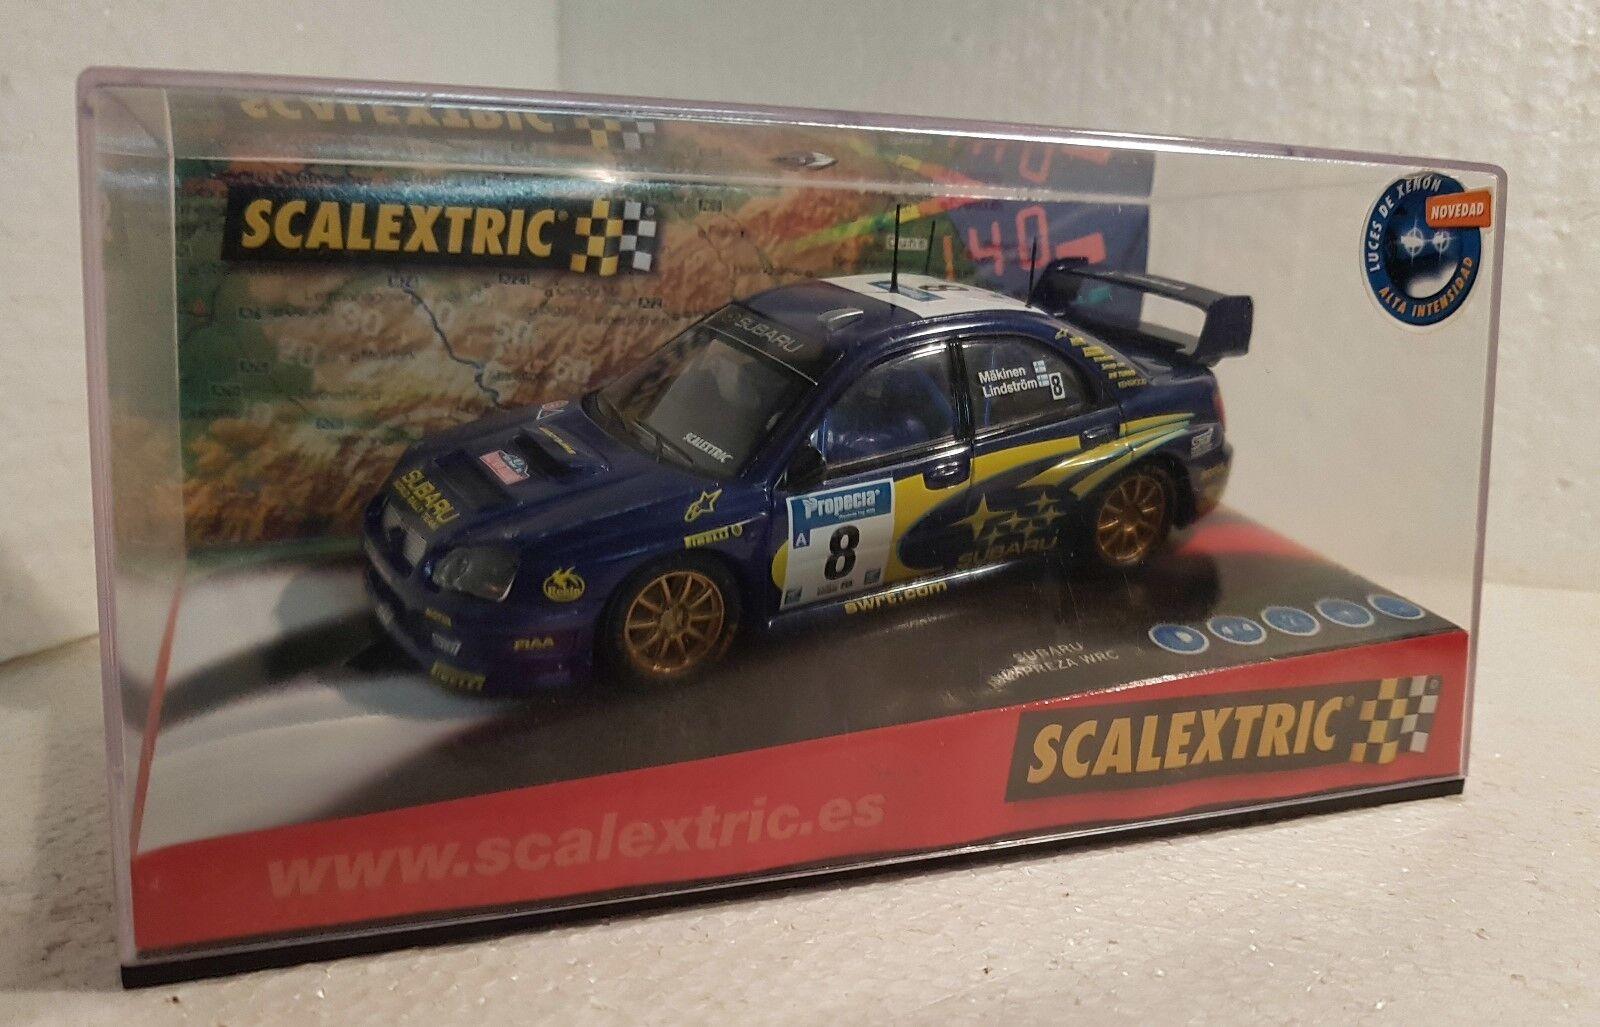 qq qq qq 6123 SCALEXTRIC SUBARU IMPREZA WRC SWRT RALLY NEUF ZELAND 8 MÄKINEN 82e88f